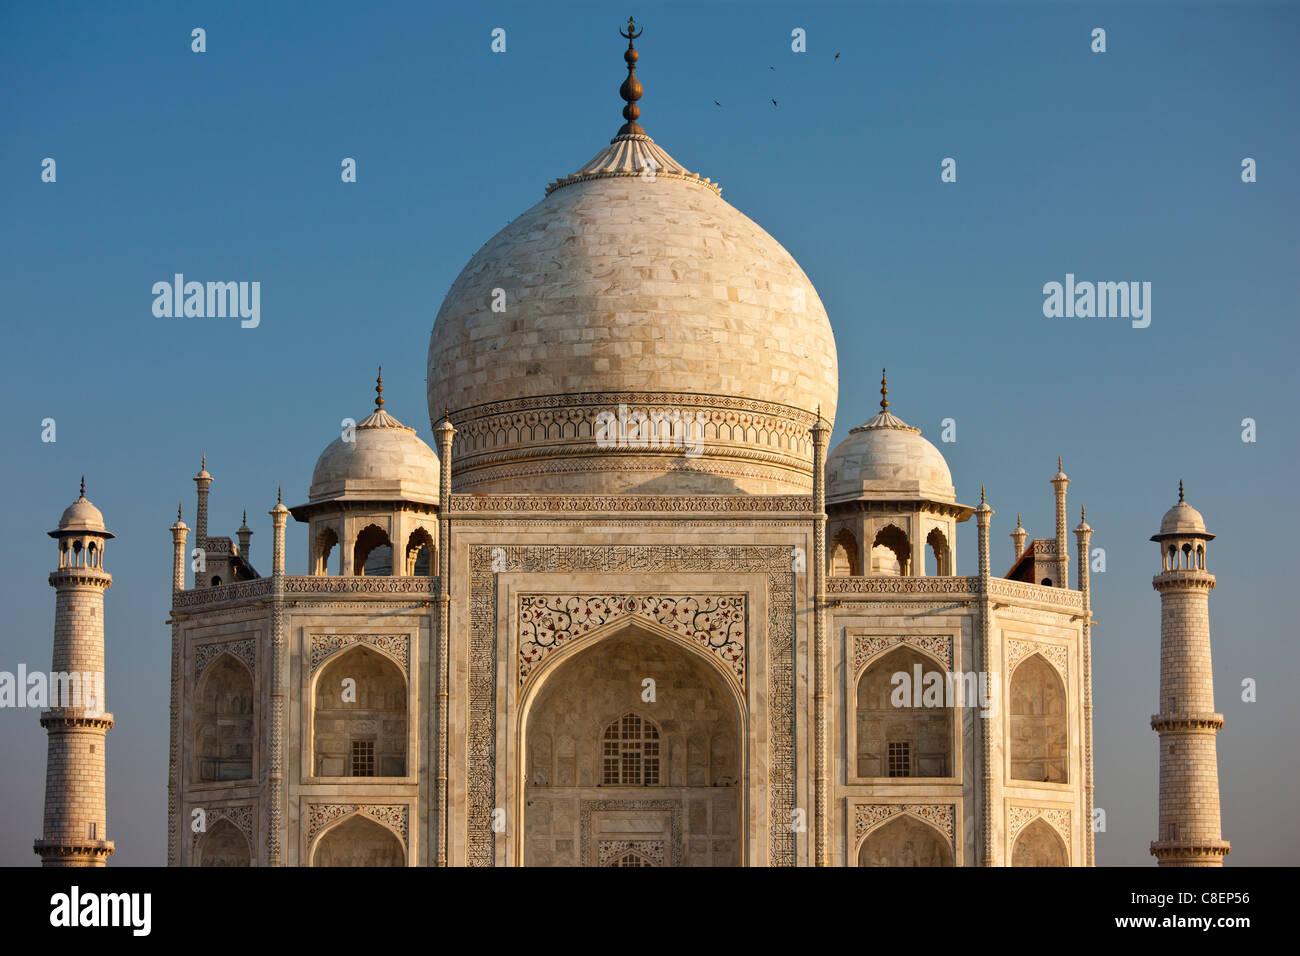 Das Taj Mahal Mausoleum Südansicht Detail, Uttar Pradesh, Indien Stockbild